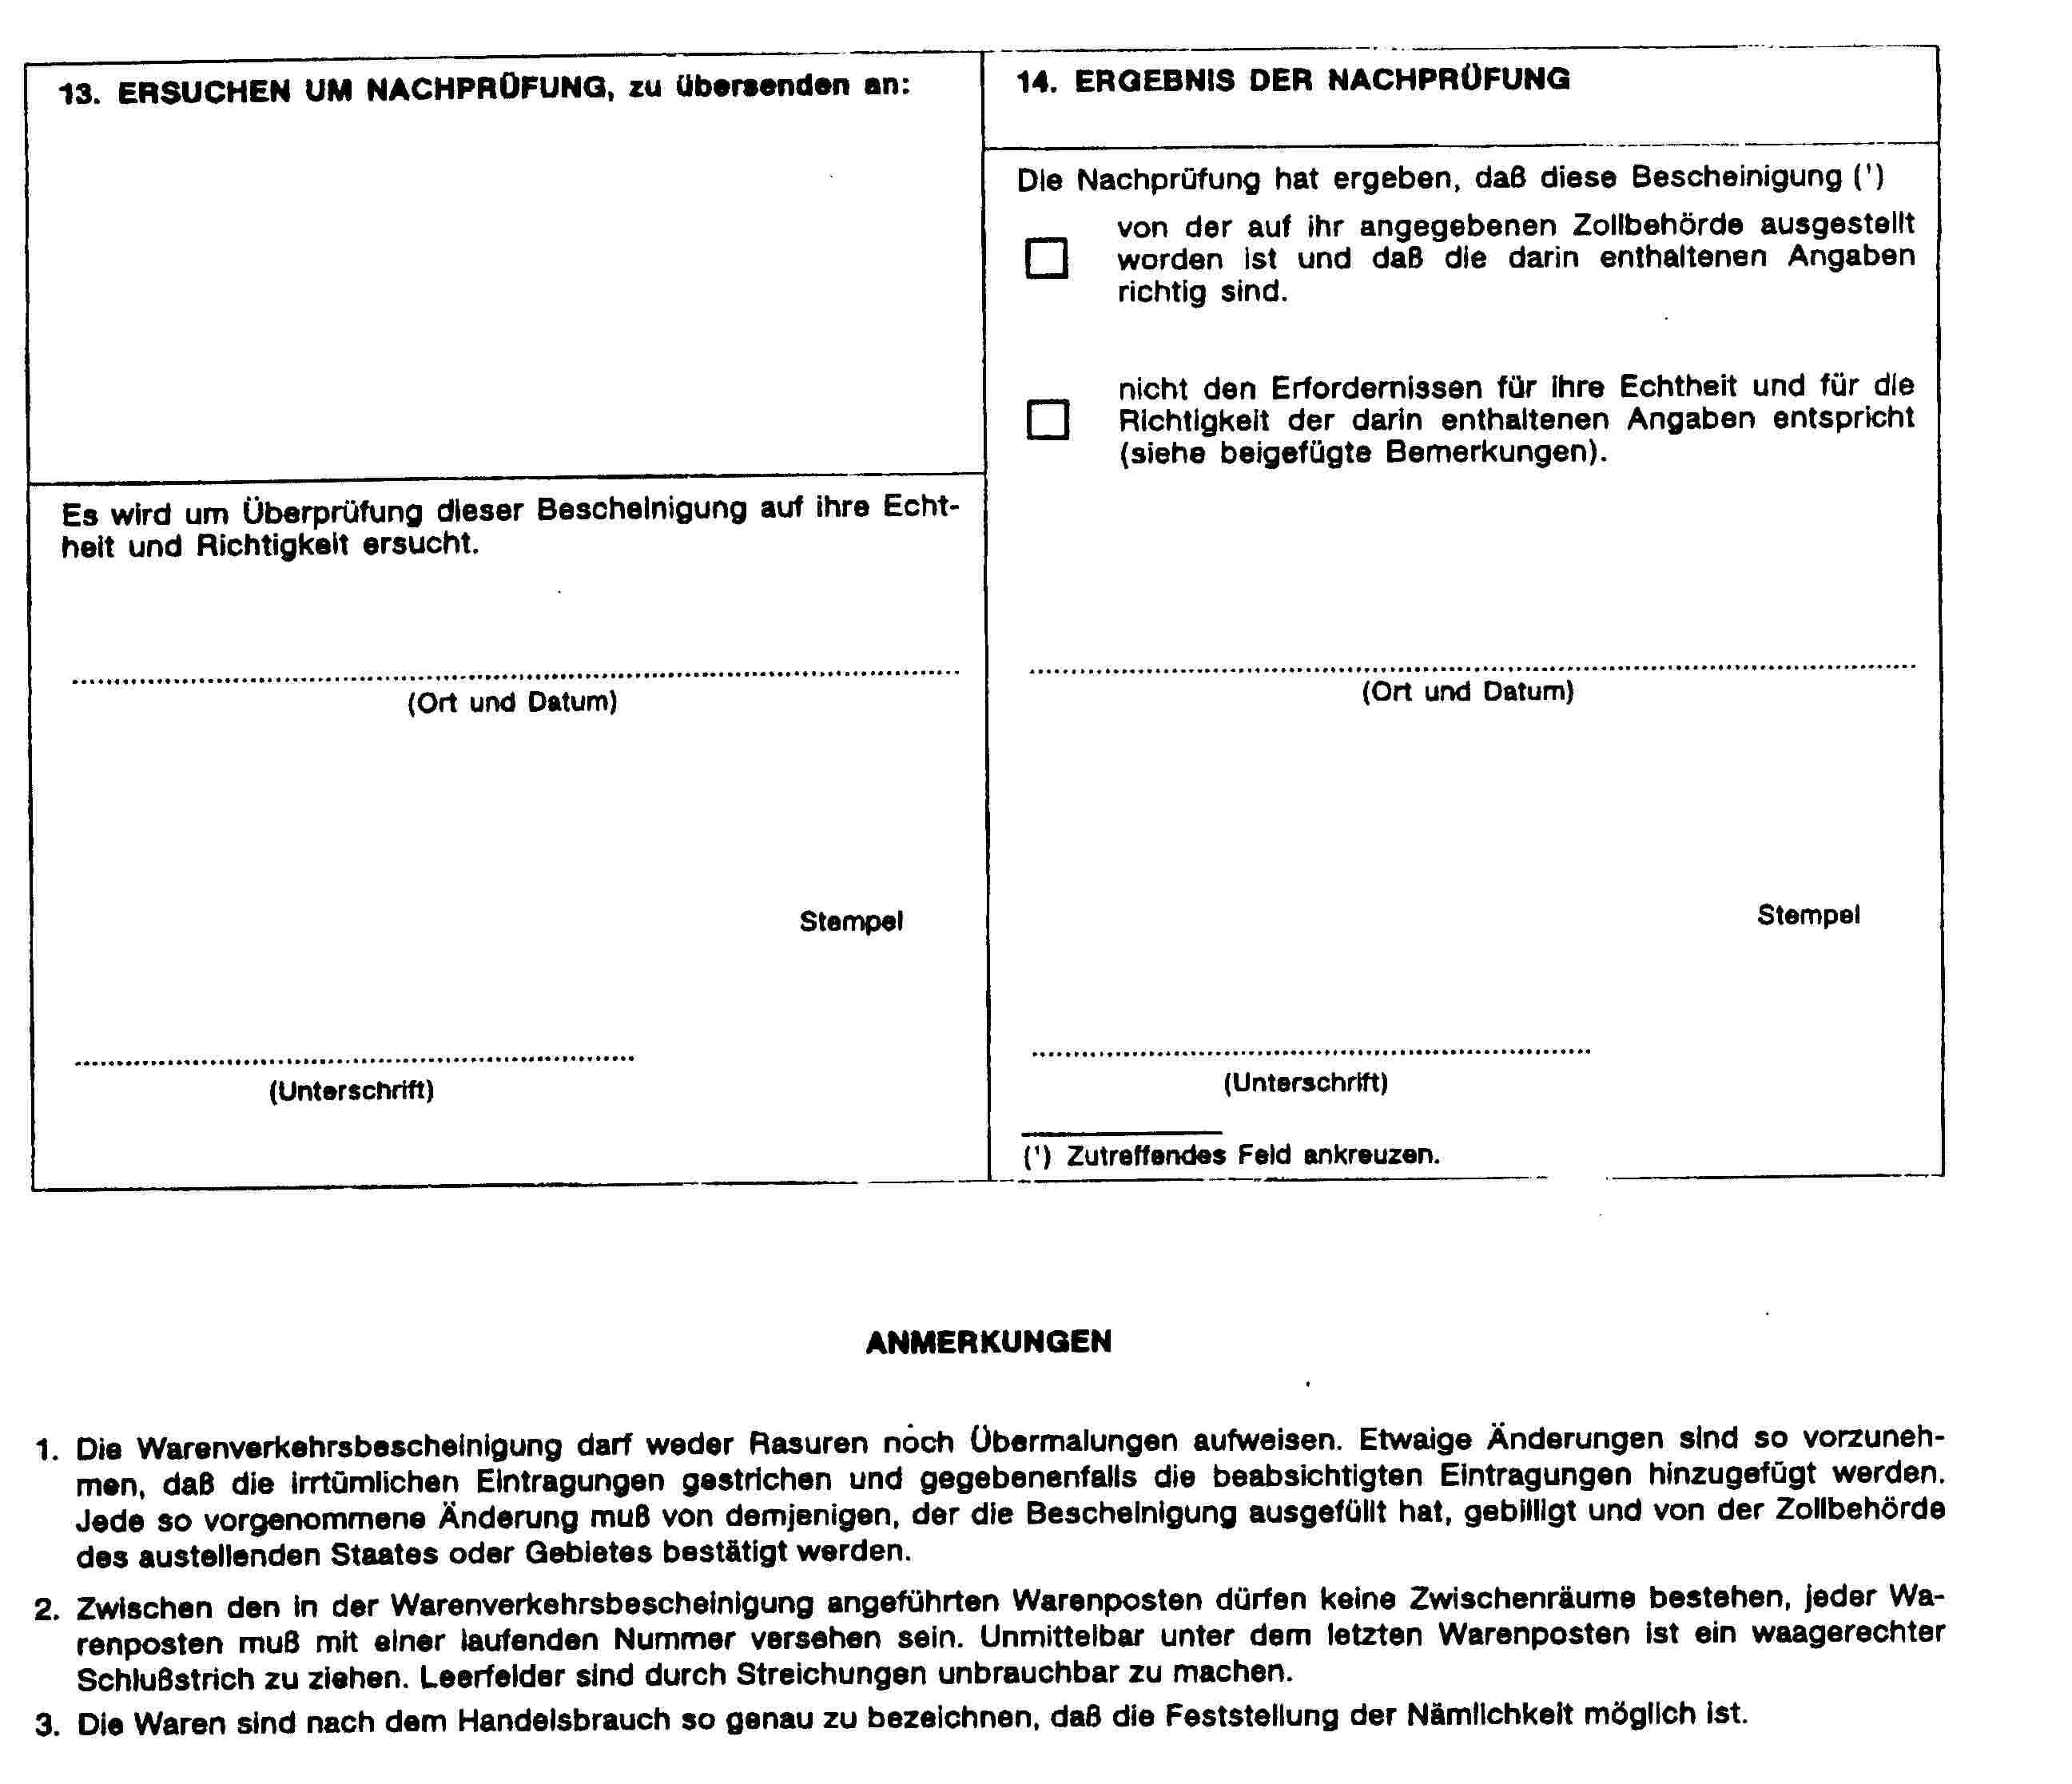 EUR-Lex - 01993R2454-20060701 - EN - EUR-Lex